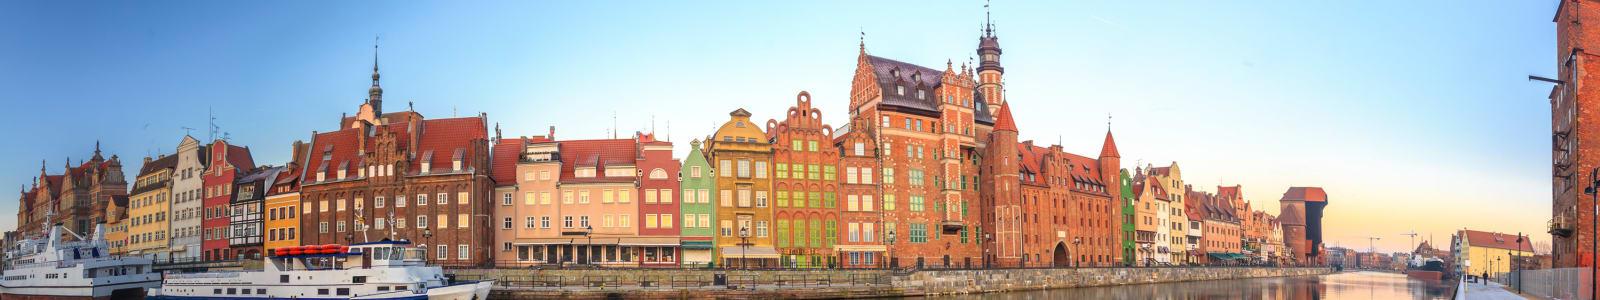 The colourful Gdansk waterside